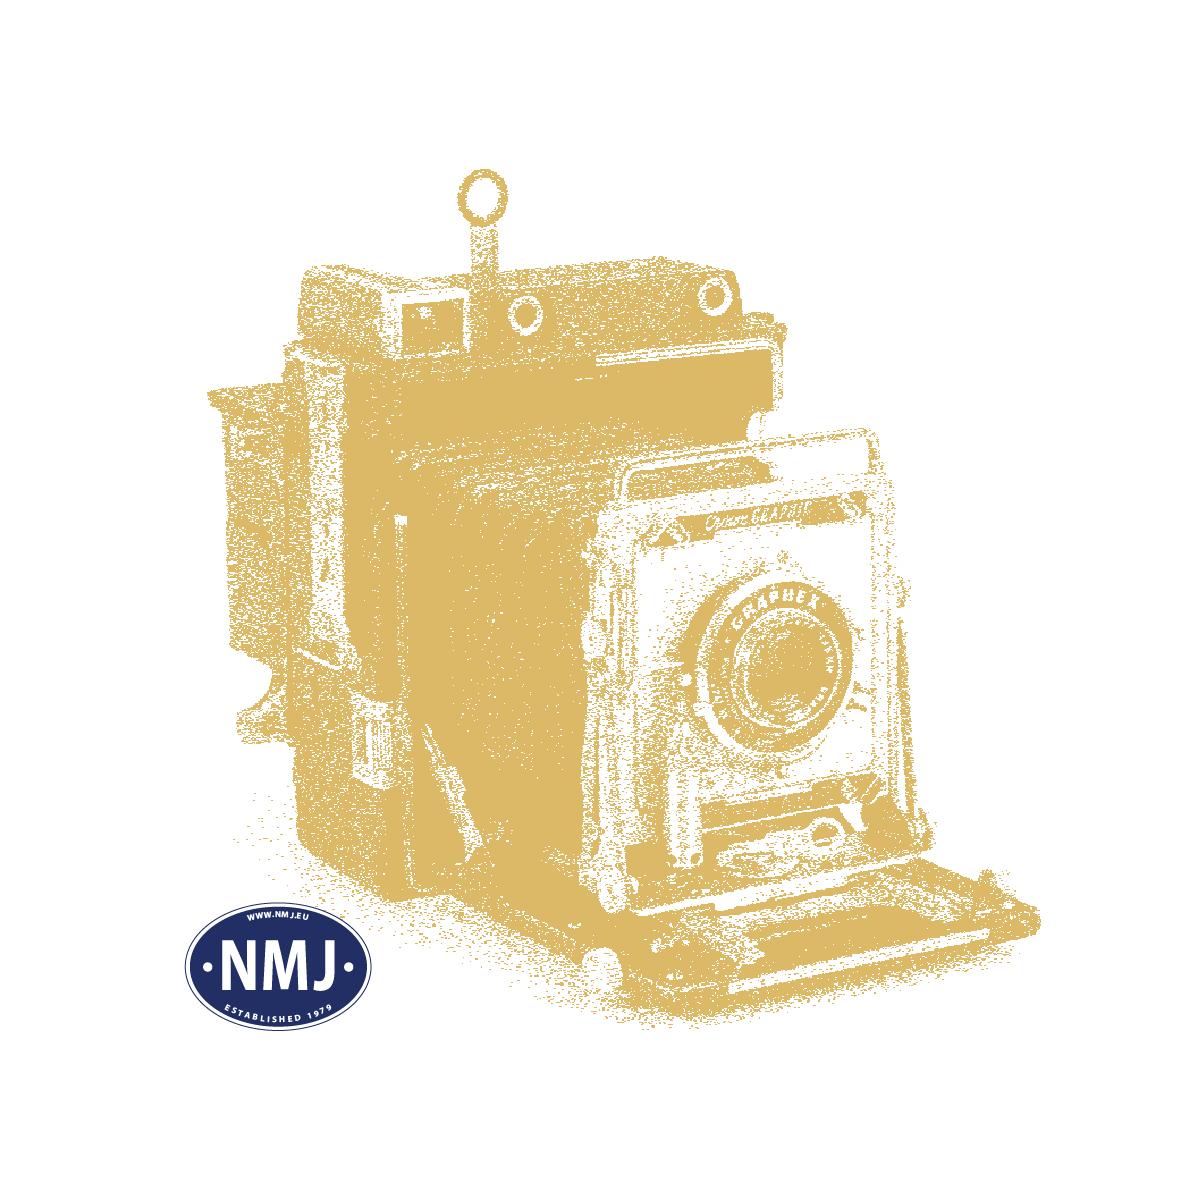 MRHMT-306 - Mr. Waterproof Sand Paper #800, 4 Ark